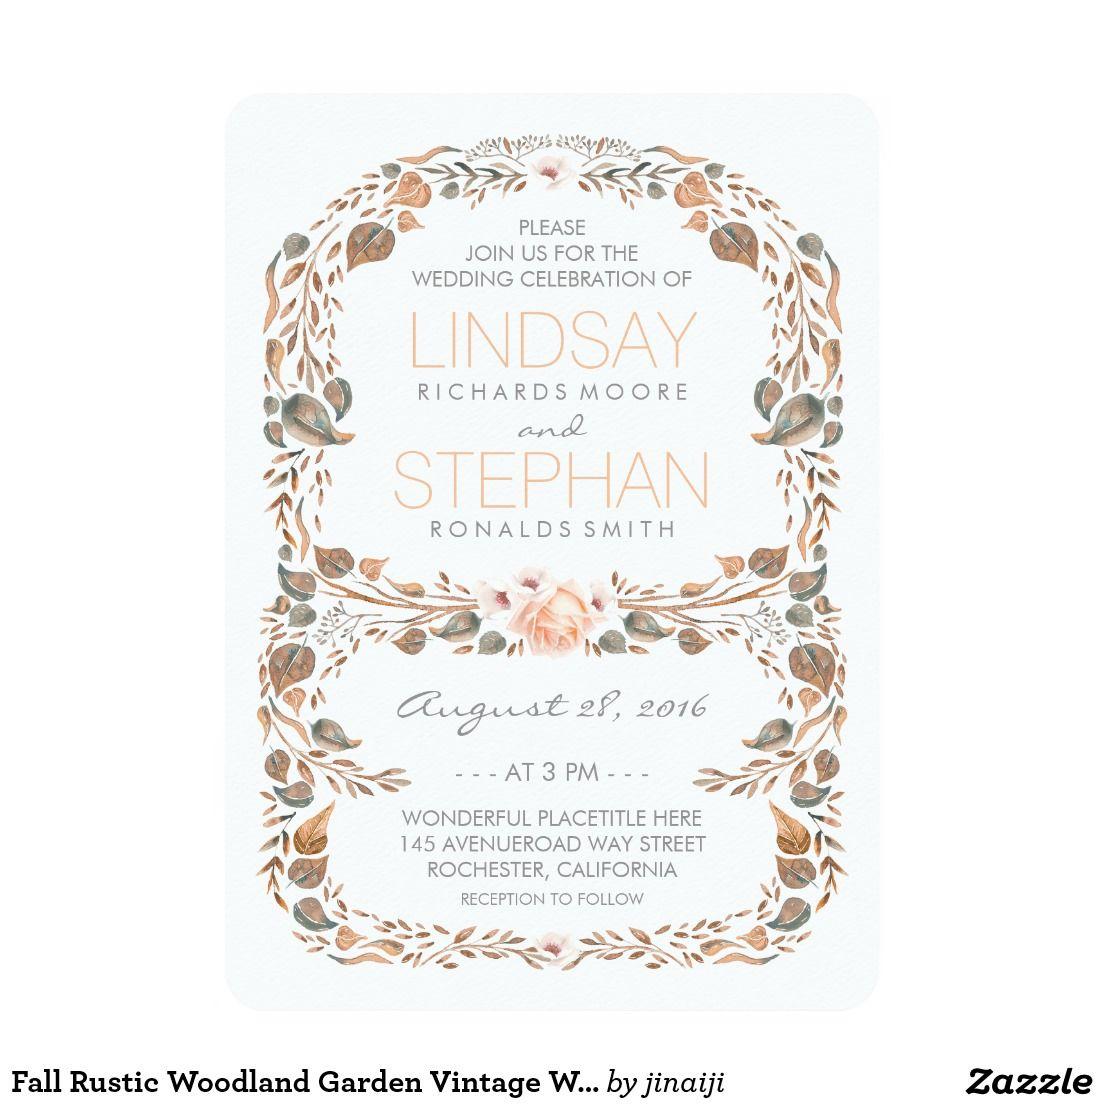 Fall Rustic Woodland Garden Vintage Wedding | Wedding Invitations ...